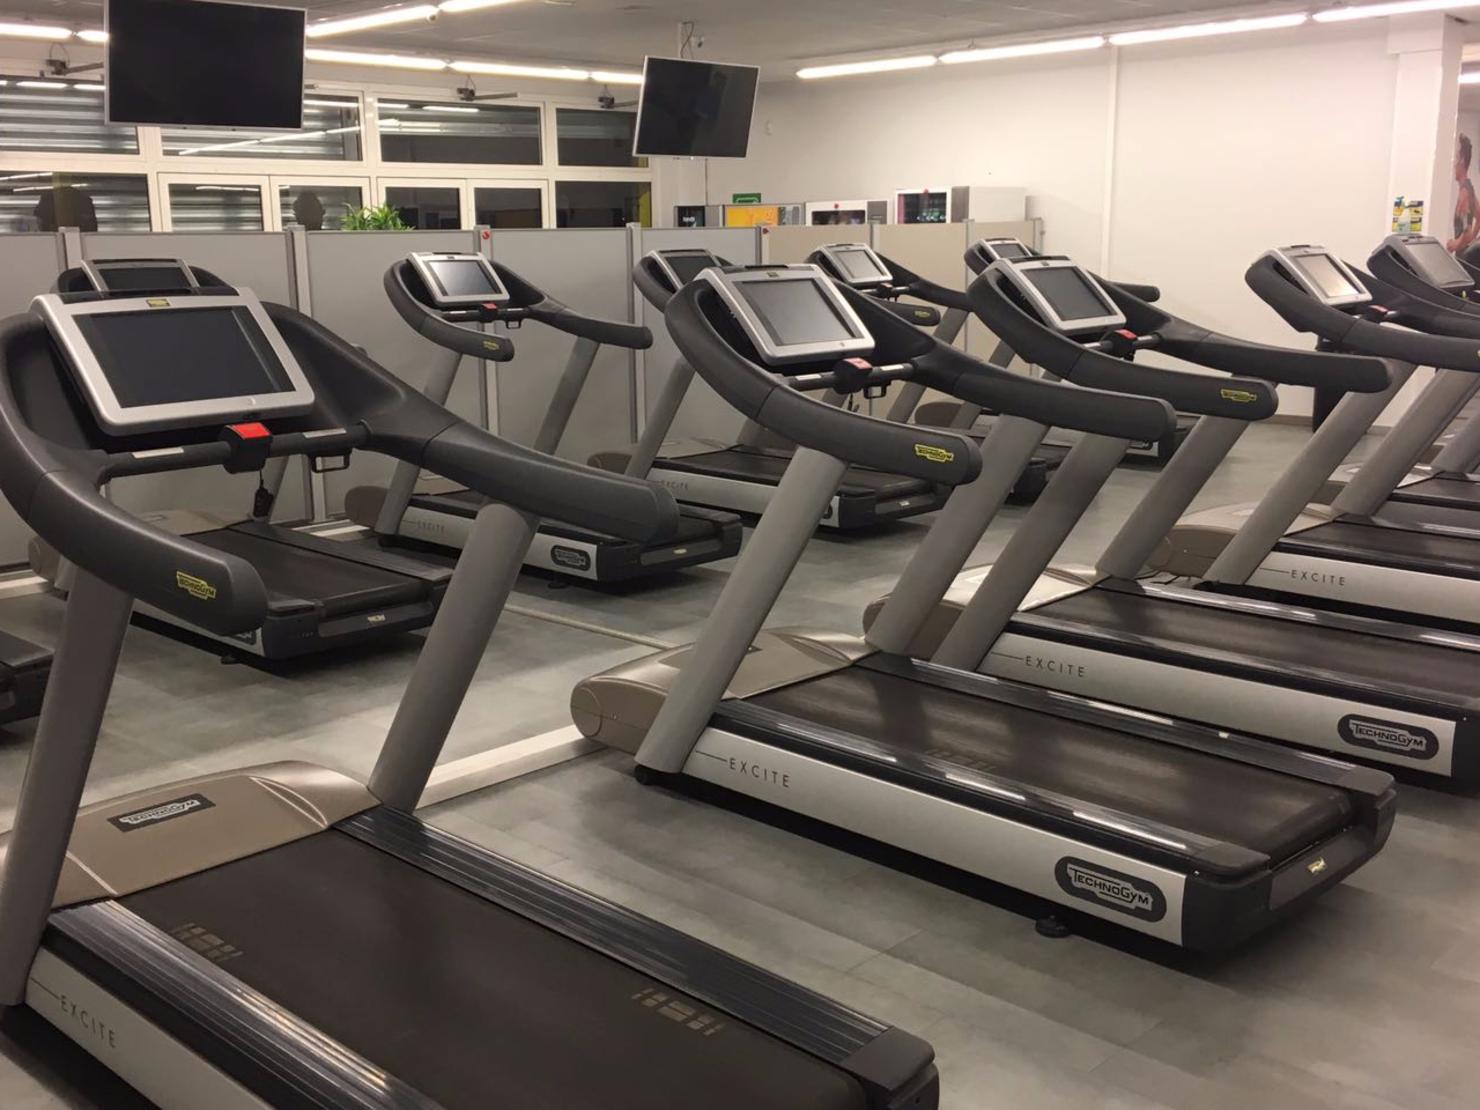 fitness park orly tarifs avis horaires offre d couverte. Black Bedroom Furniture Sets. Home Design Ideas